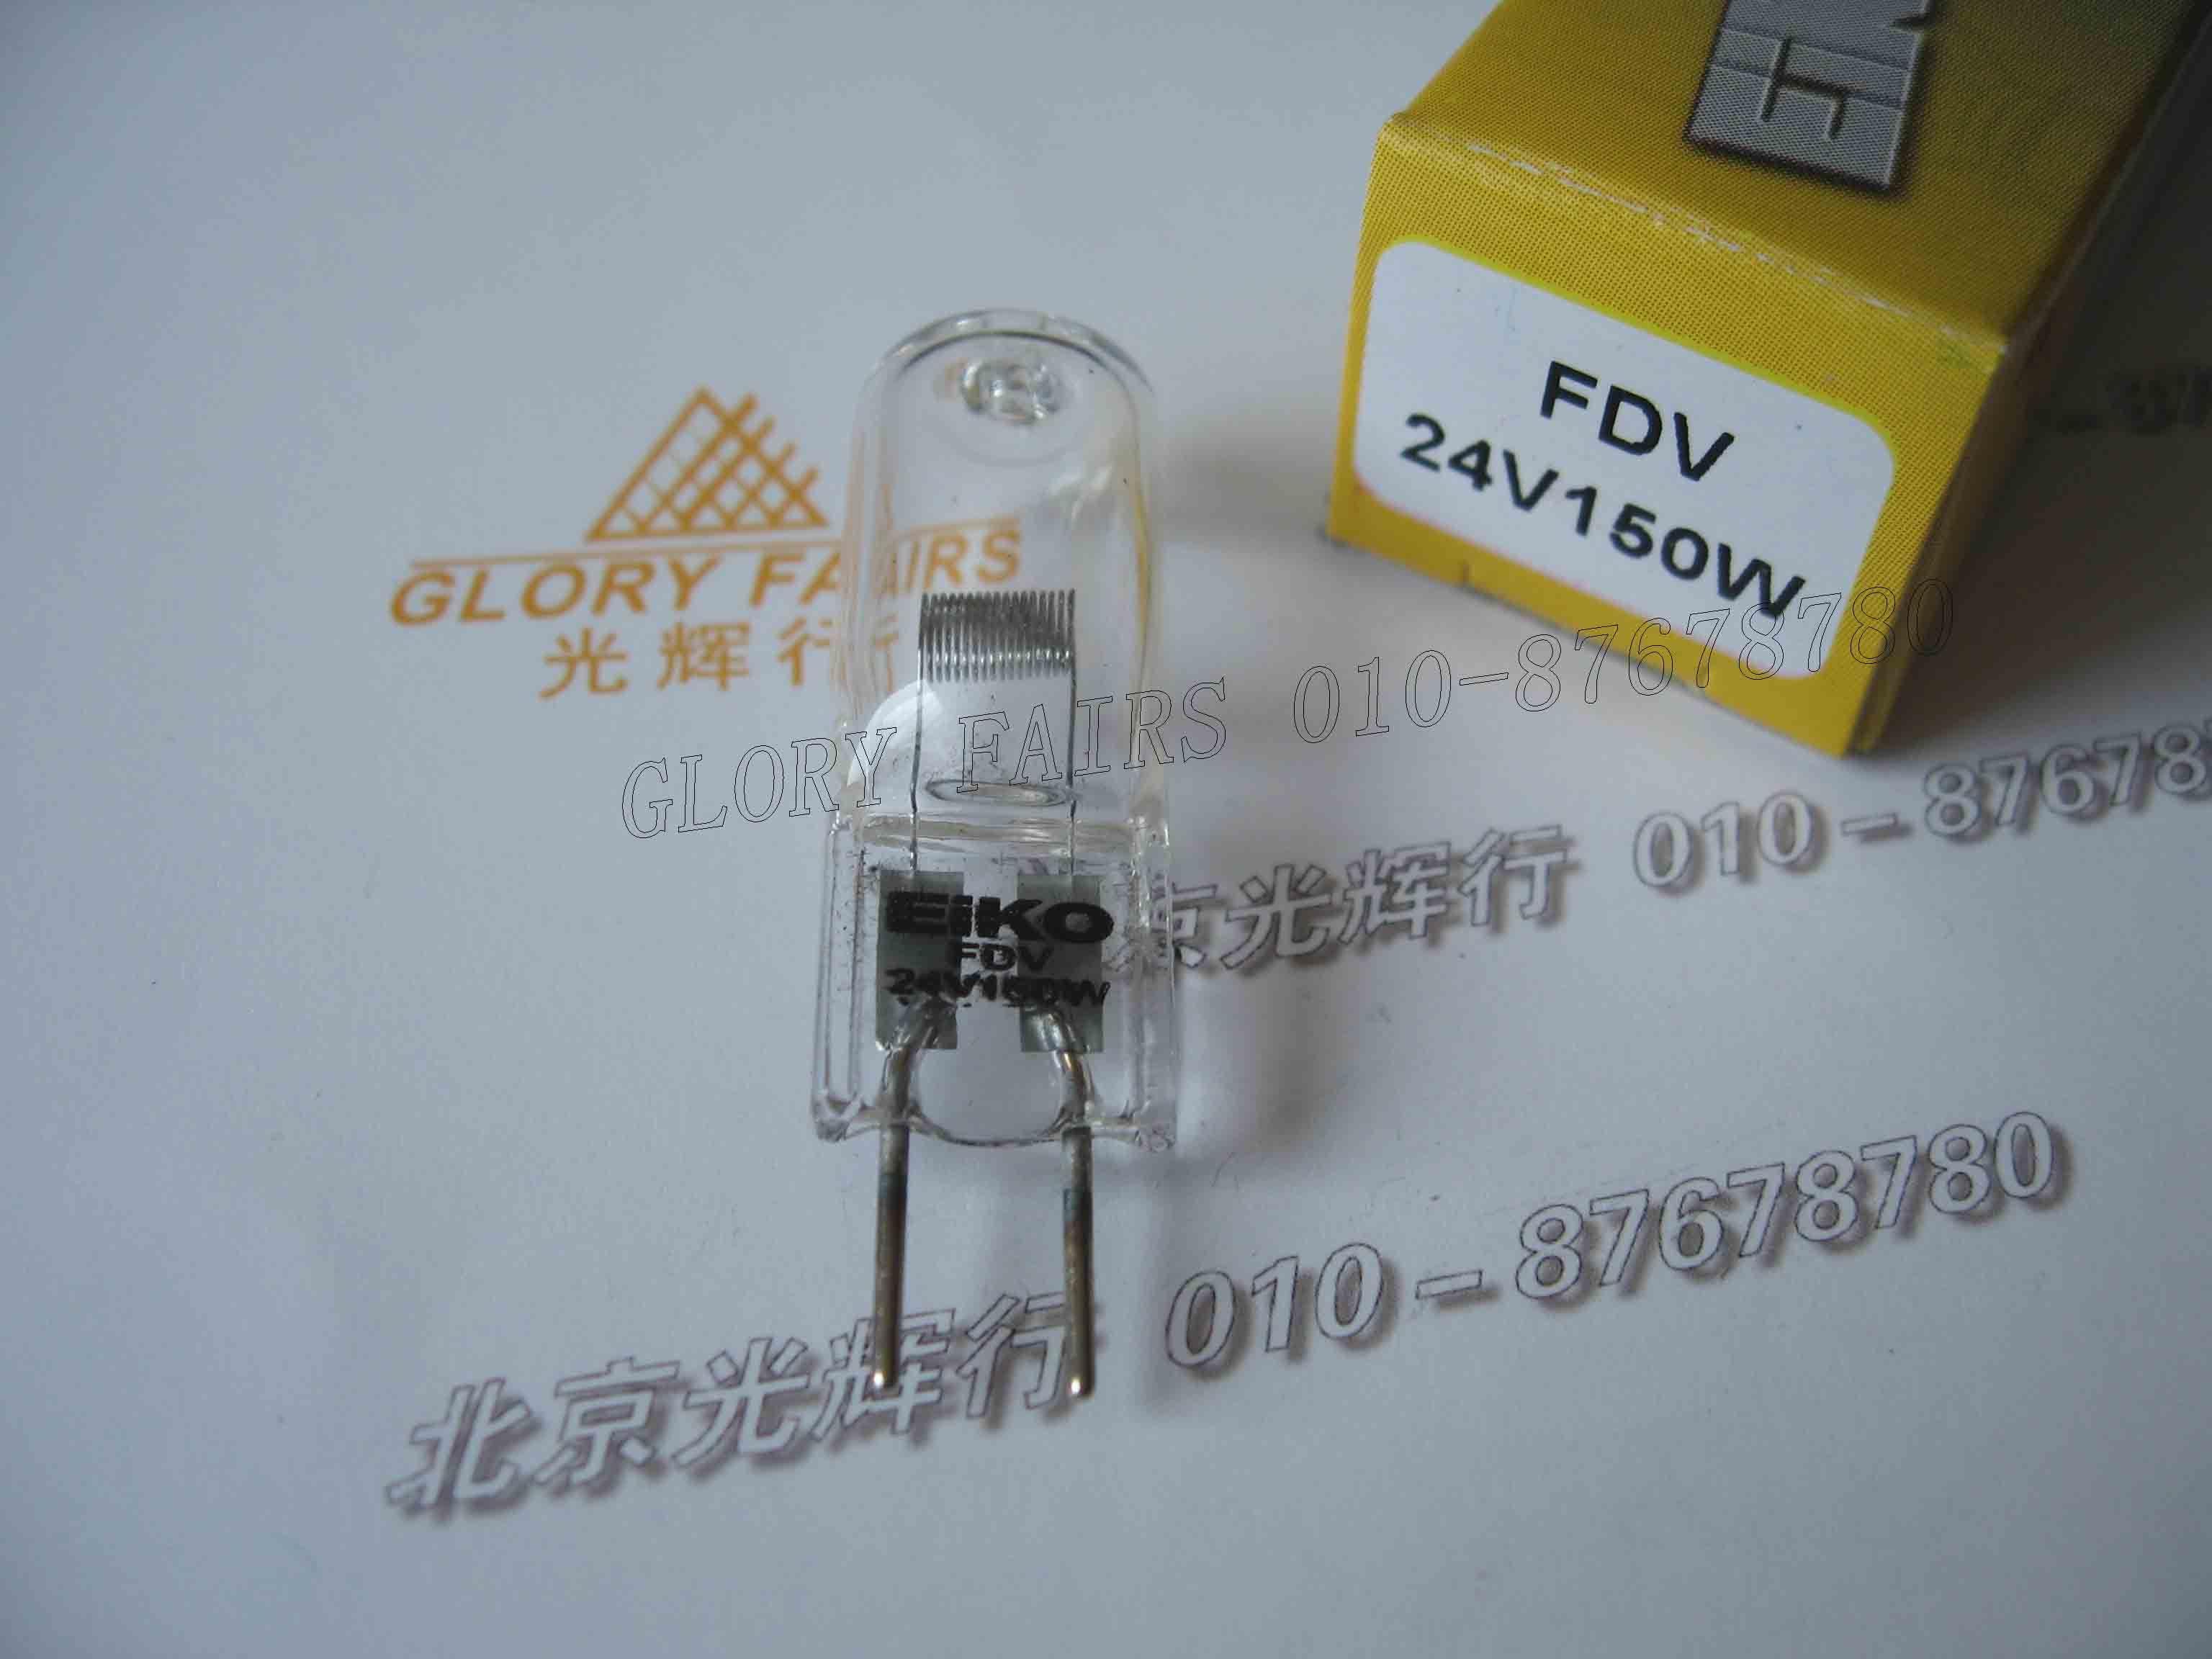 EIKO FDV 24V 150W halogen lamp,operation room lighting,medical illumination,overhead projector,surgical lights,24V 150W bulb(China (Mainland))